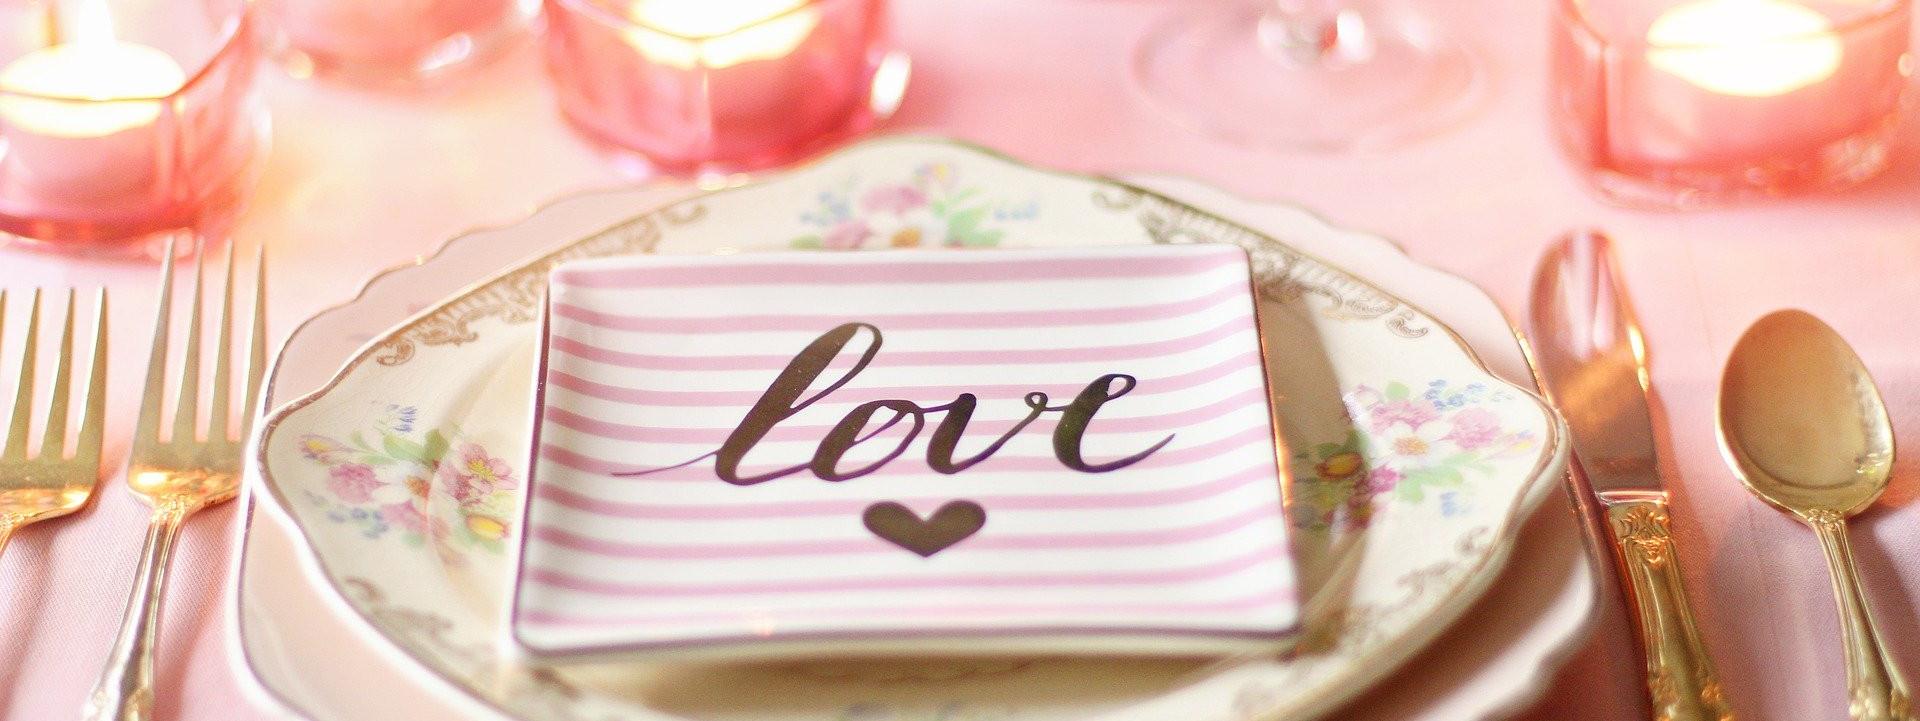 Love - Table Setting